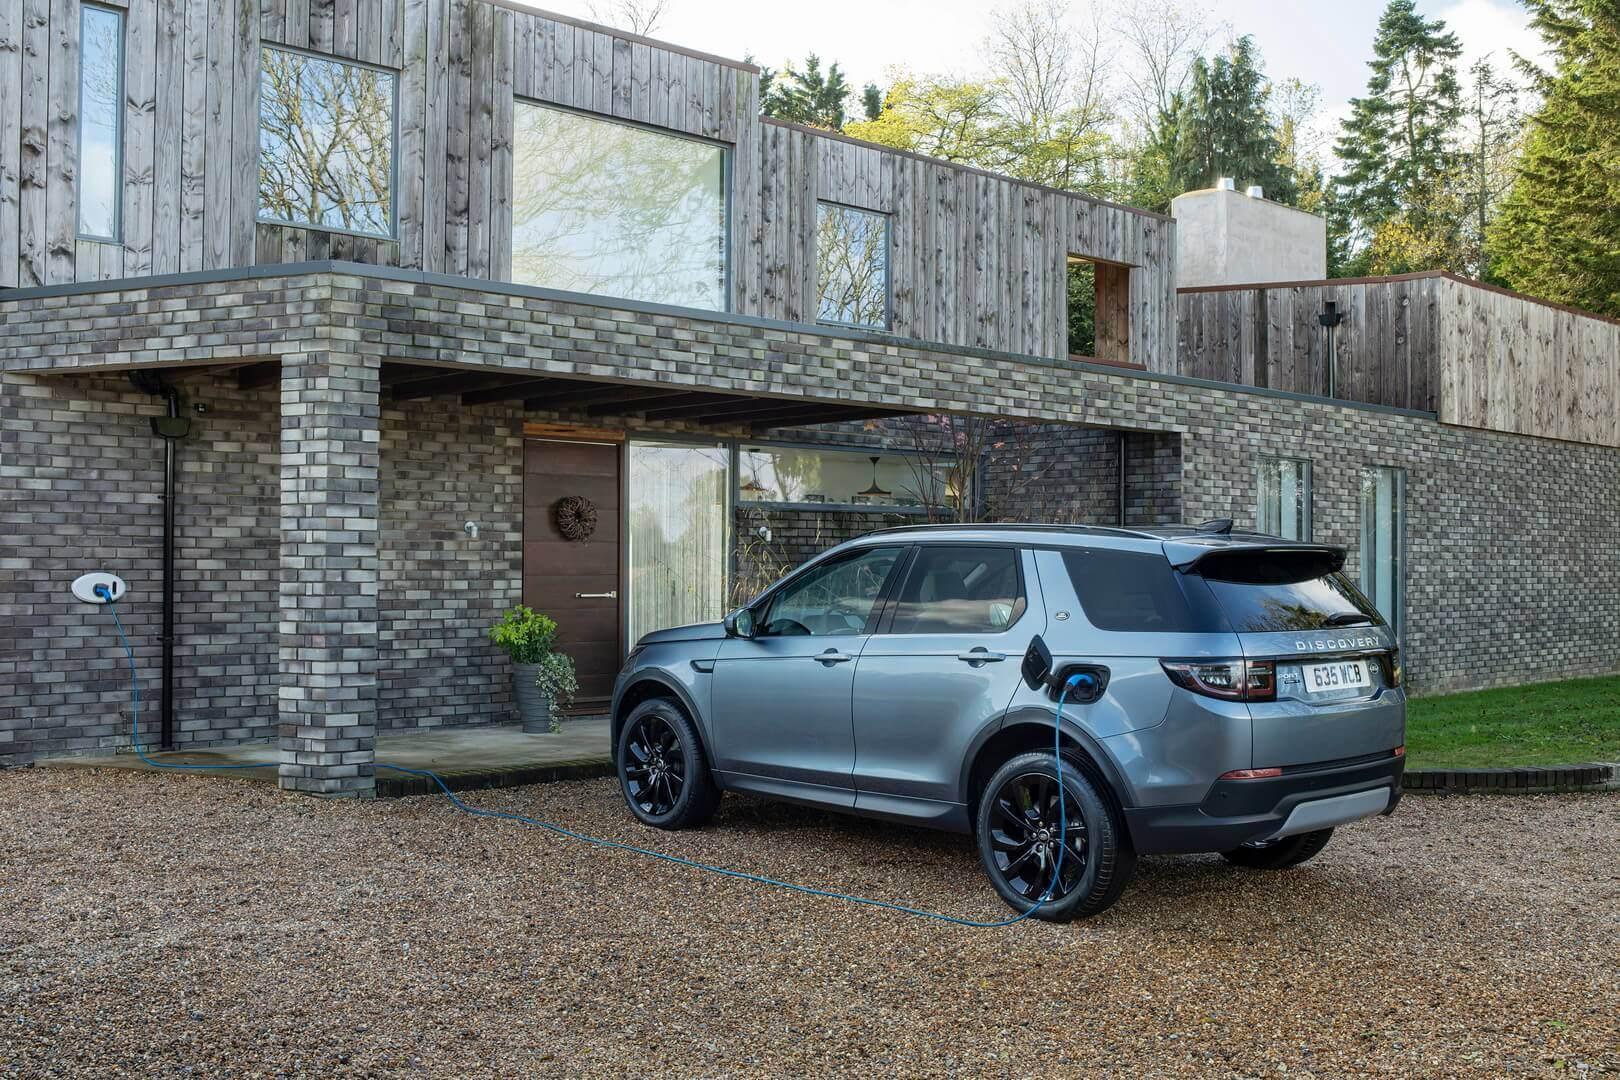 Плагін-гібрид Land Rover Discovery Sport P300e